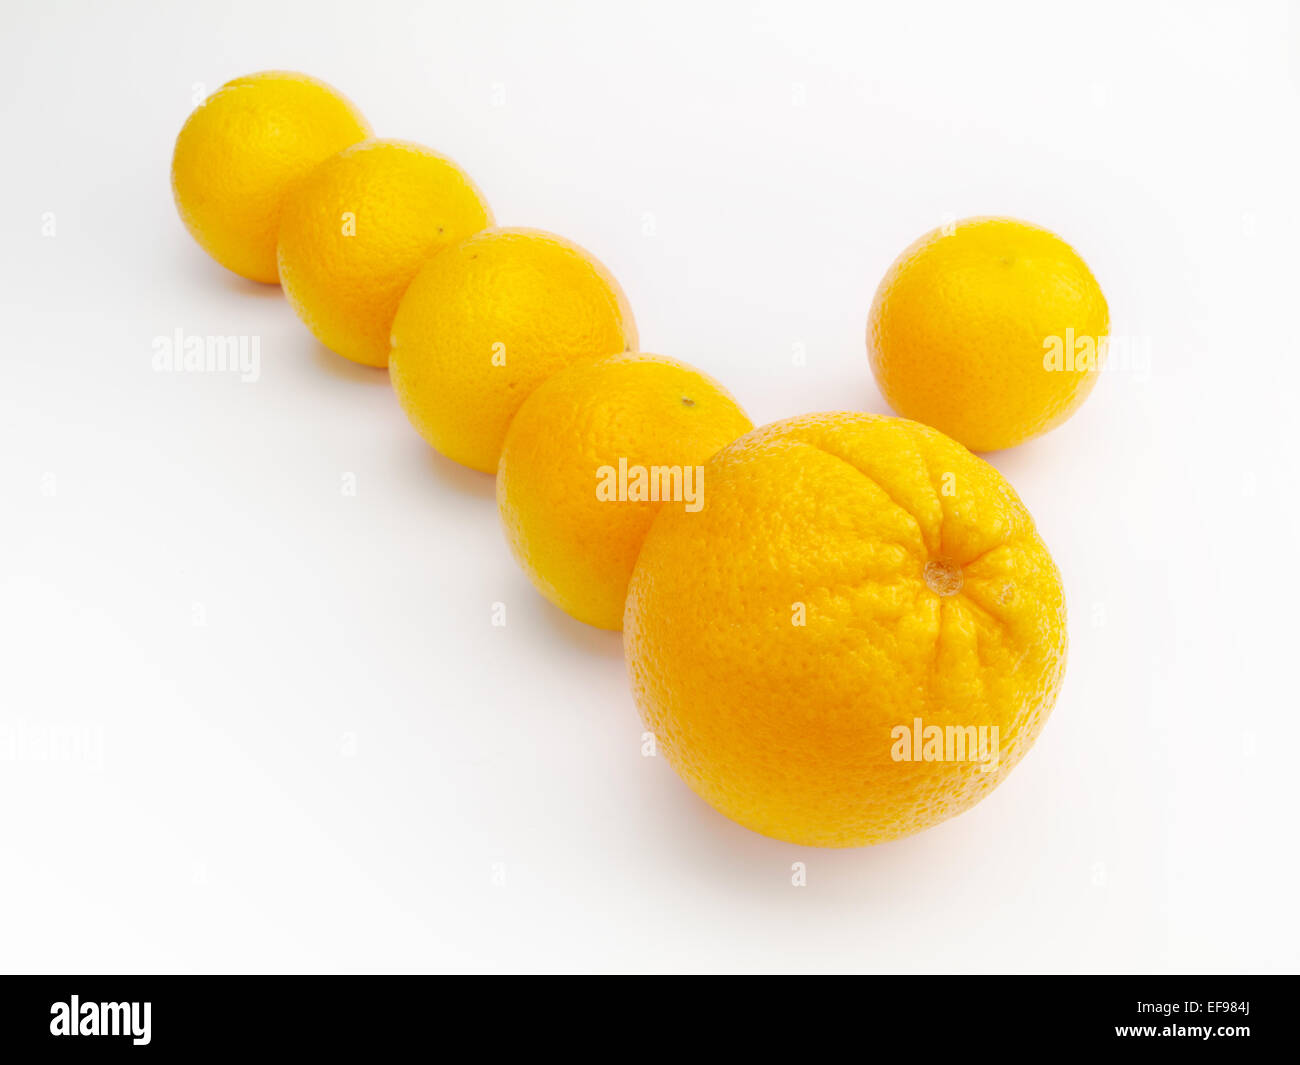 oranges isolated on a white background - Stock Image